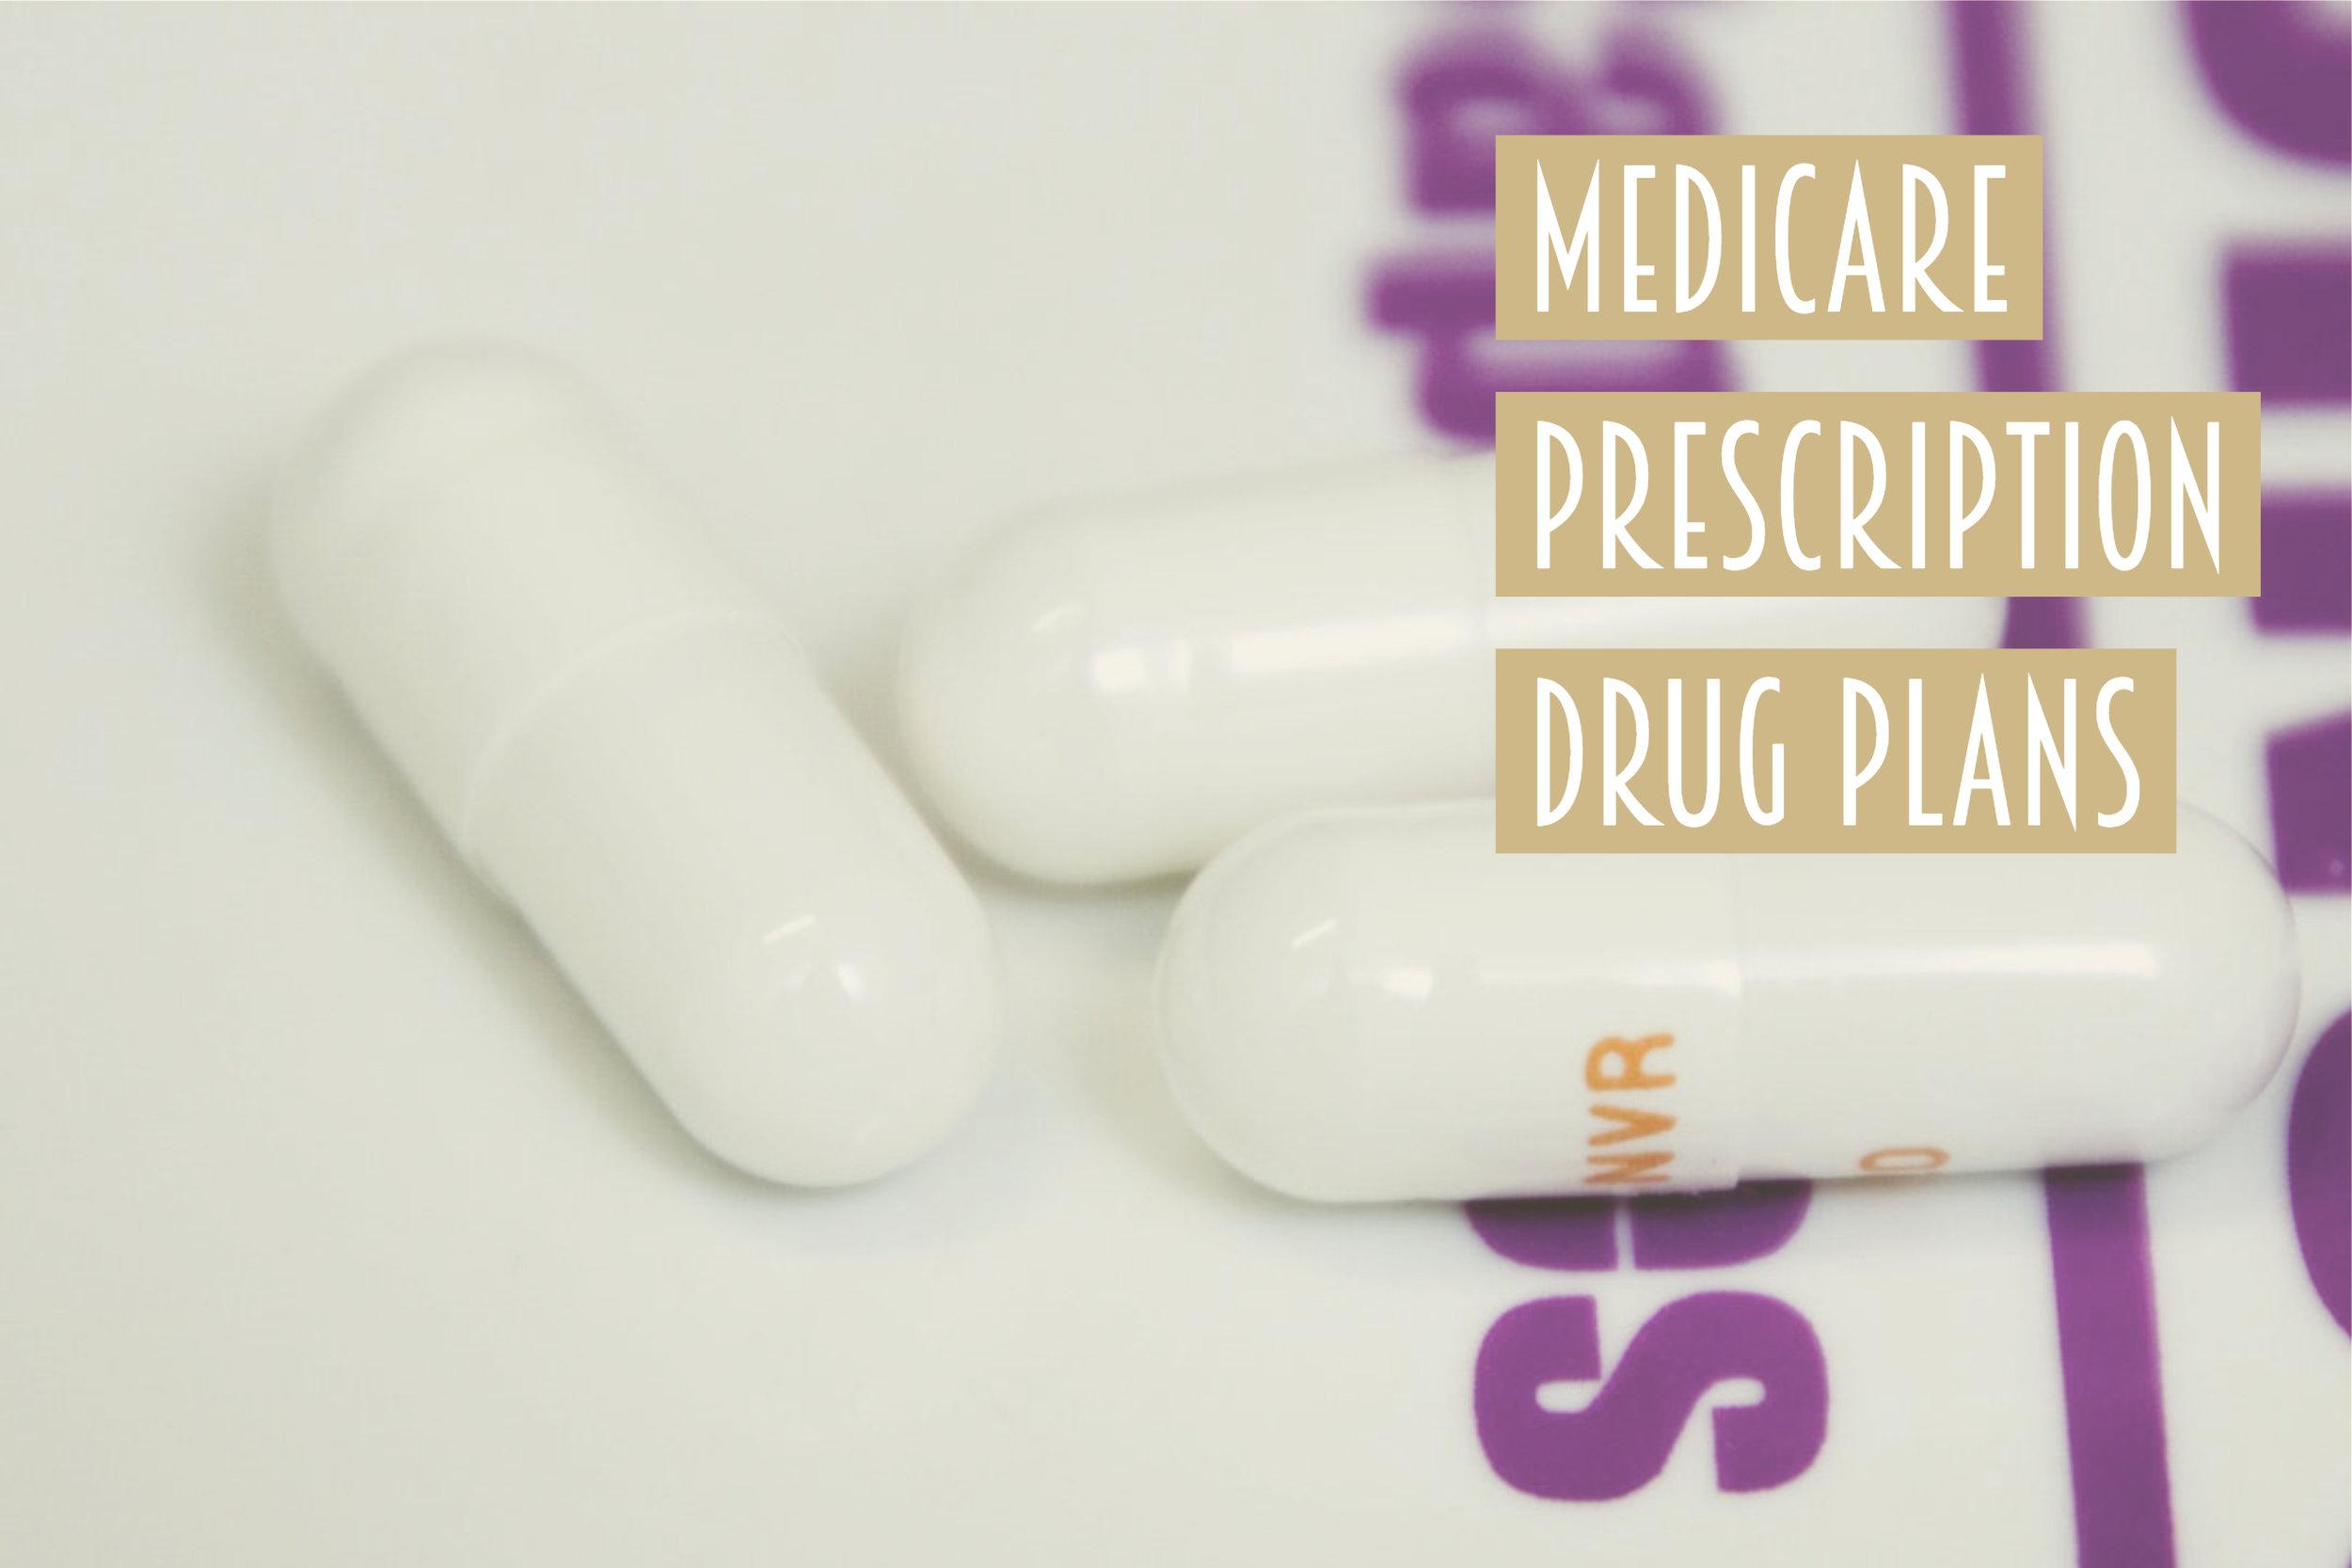 Medicare Prescription Drug Plans.jpg